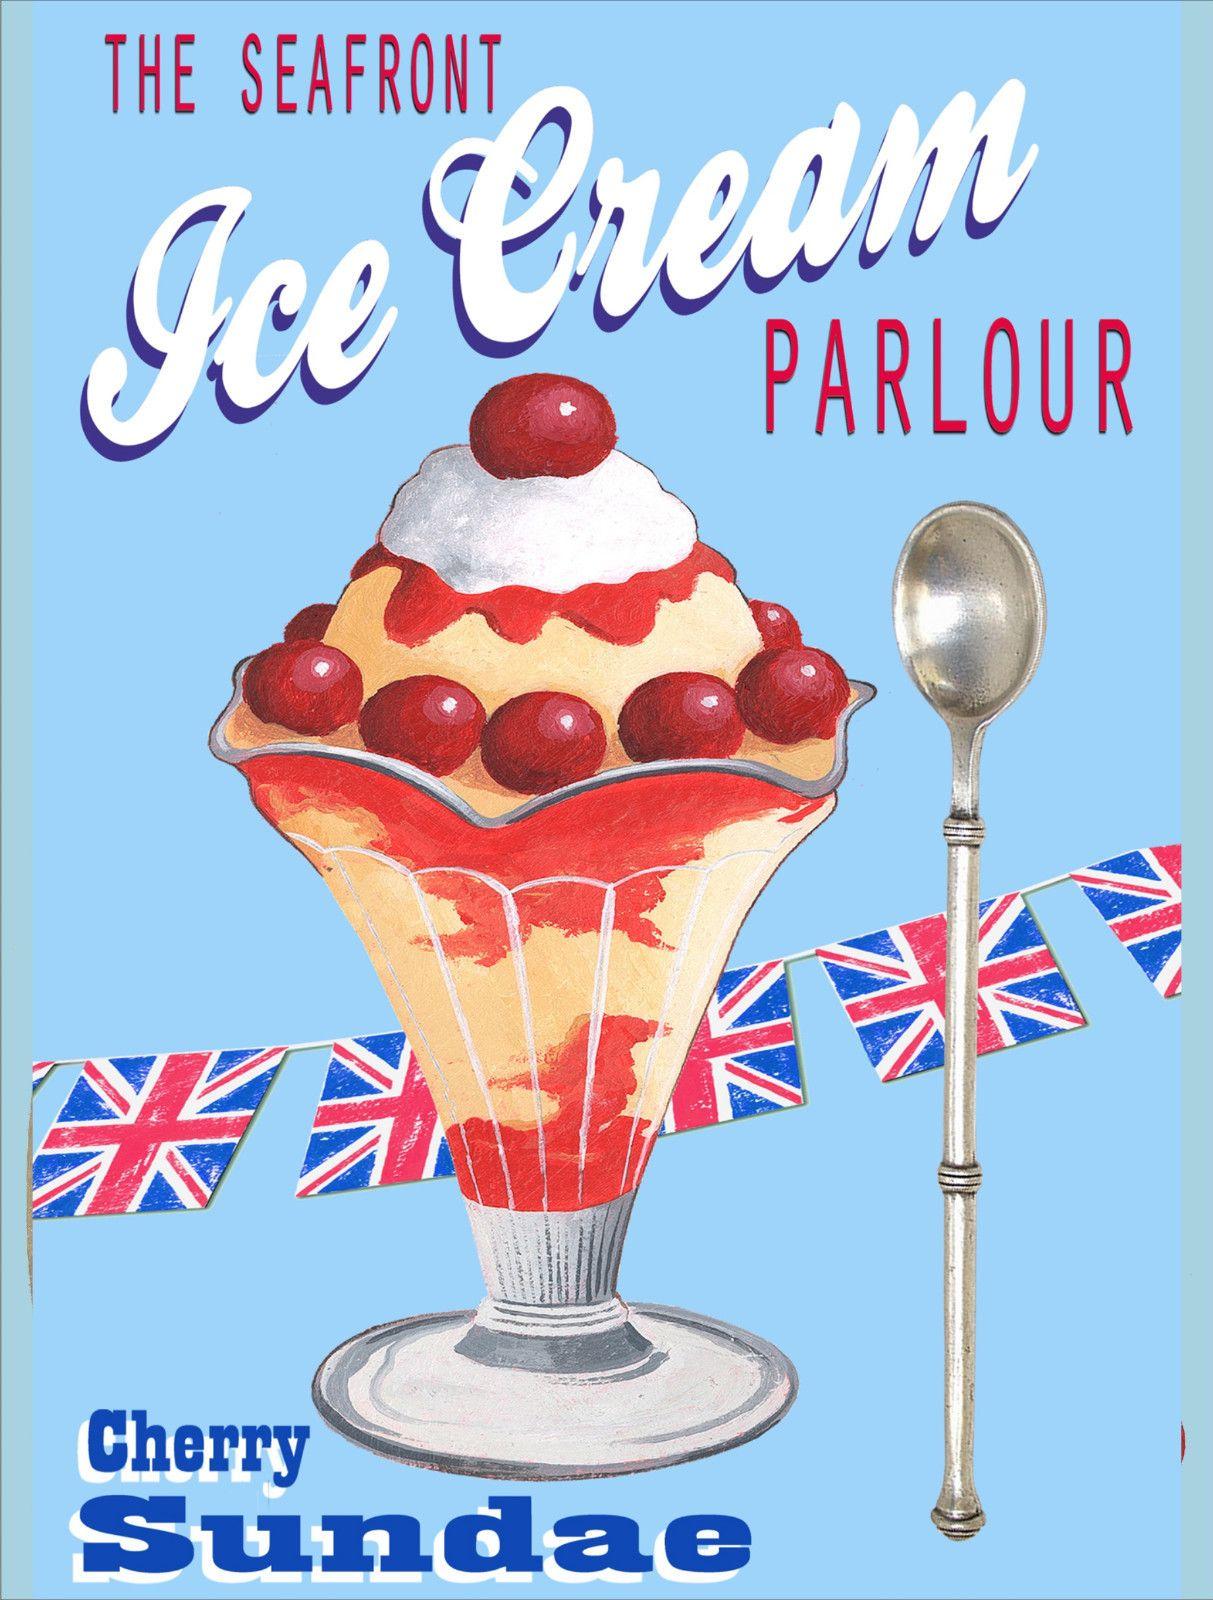 Details About New Retro Cherry Sundae Ice Cream 24 Vintage Style